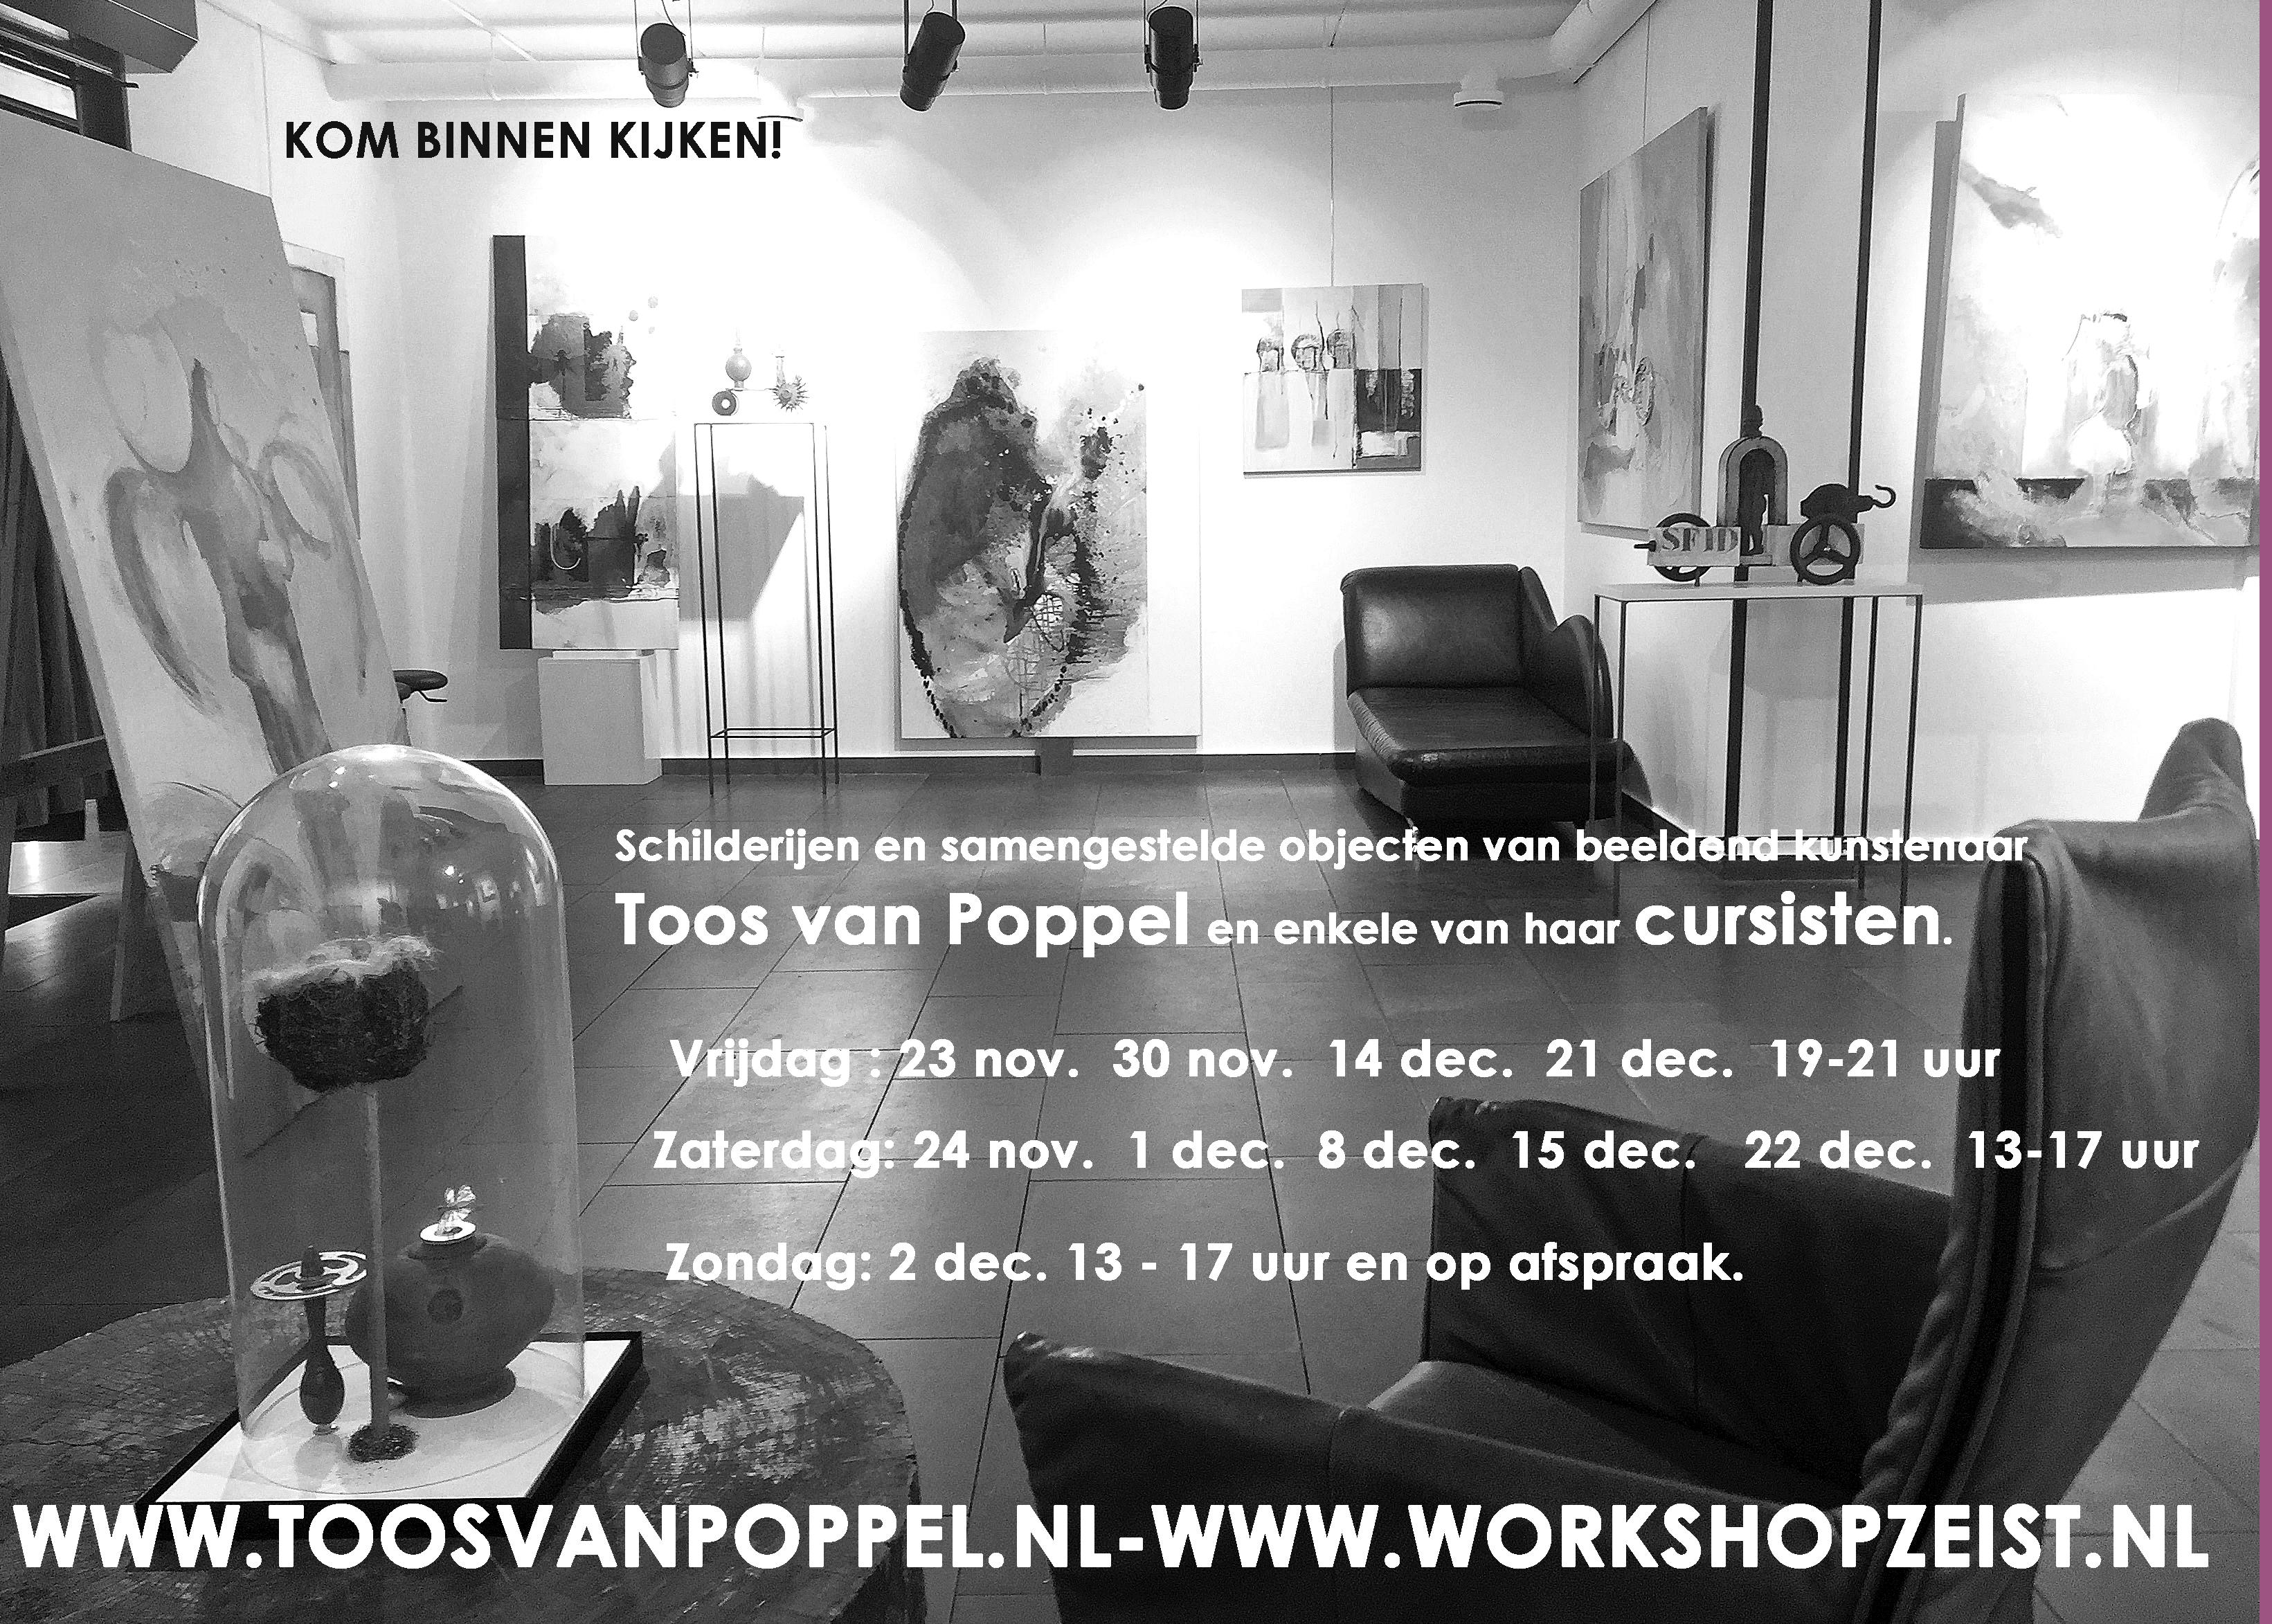 Toos van Poppel poppel up store